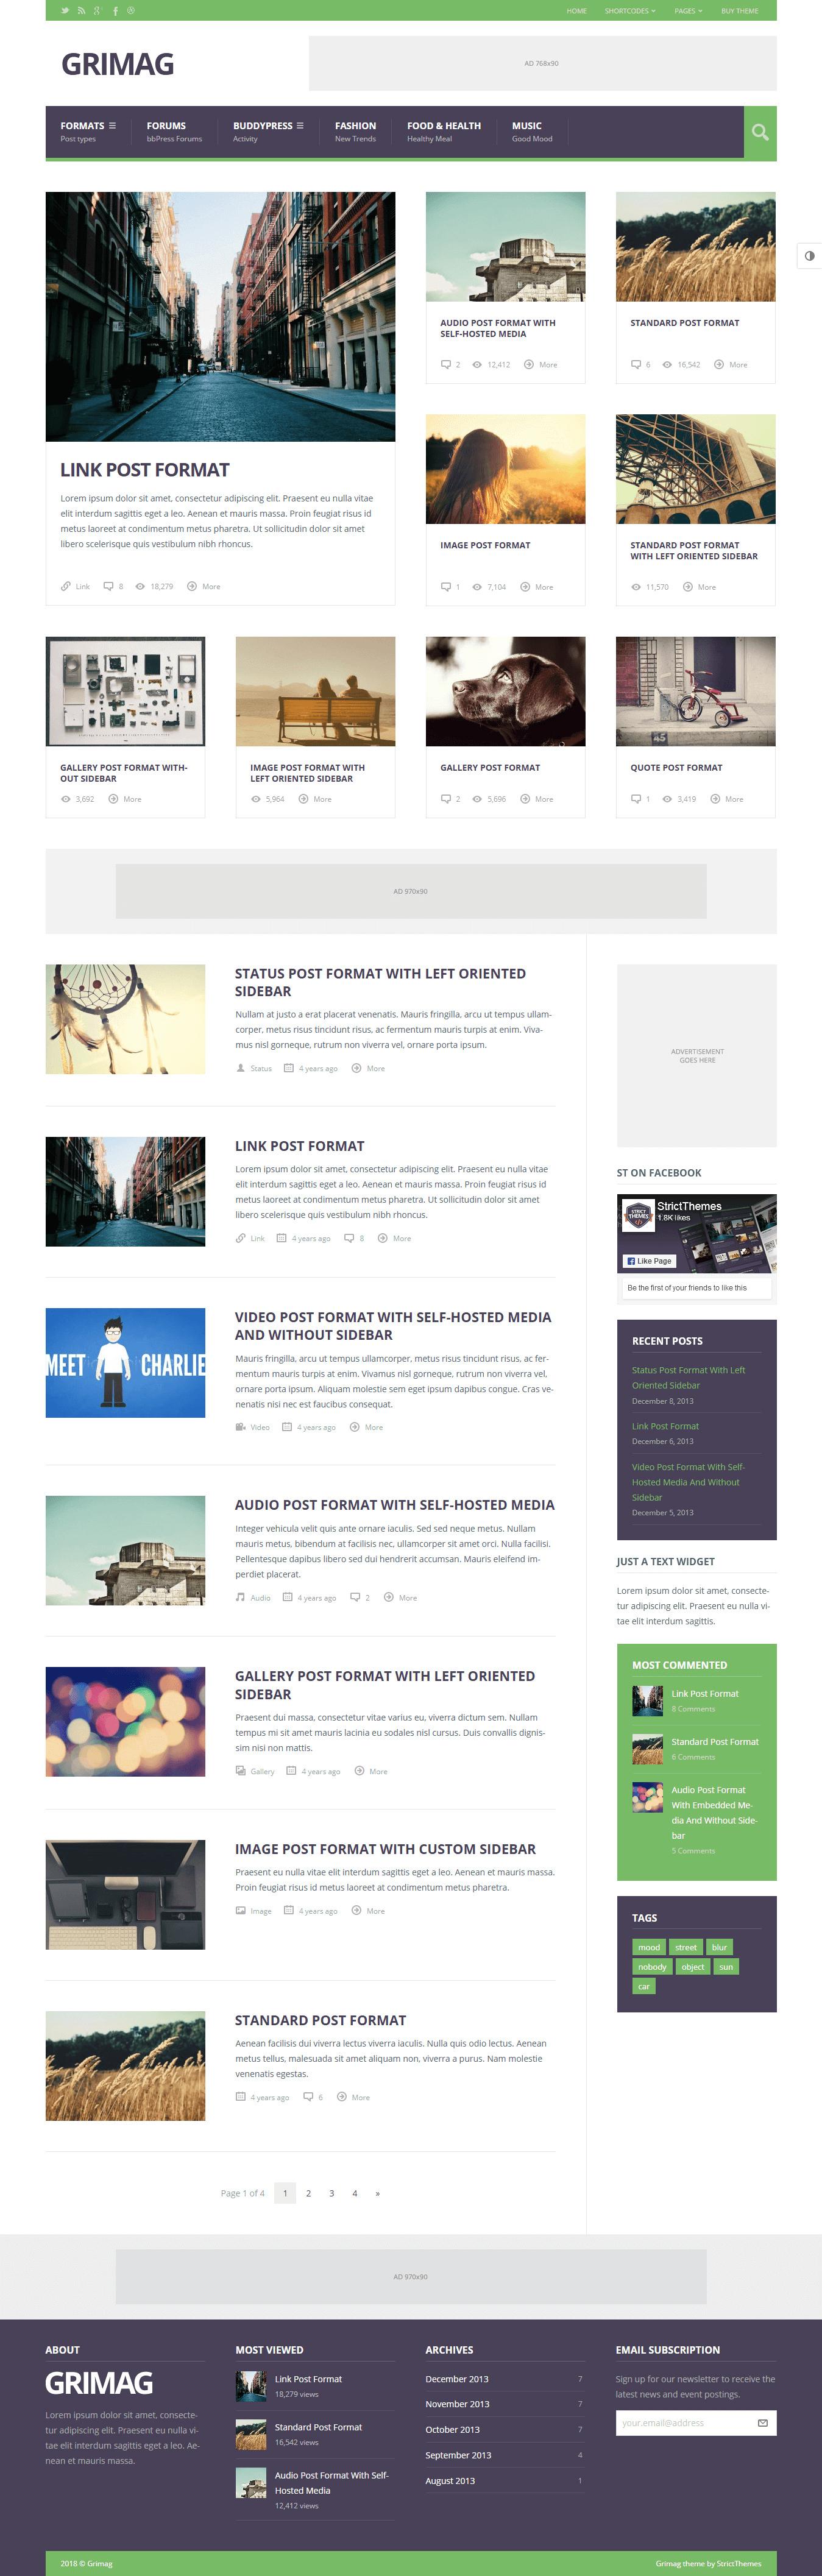 Grimag - Best Premium Adsense Optimized WordPress Theme